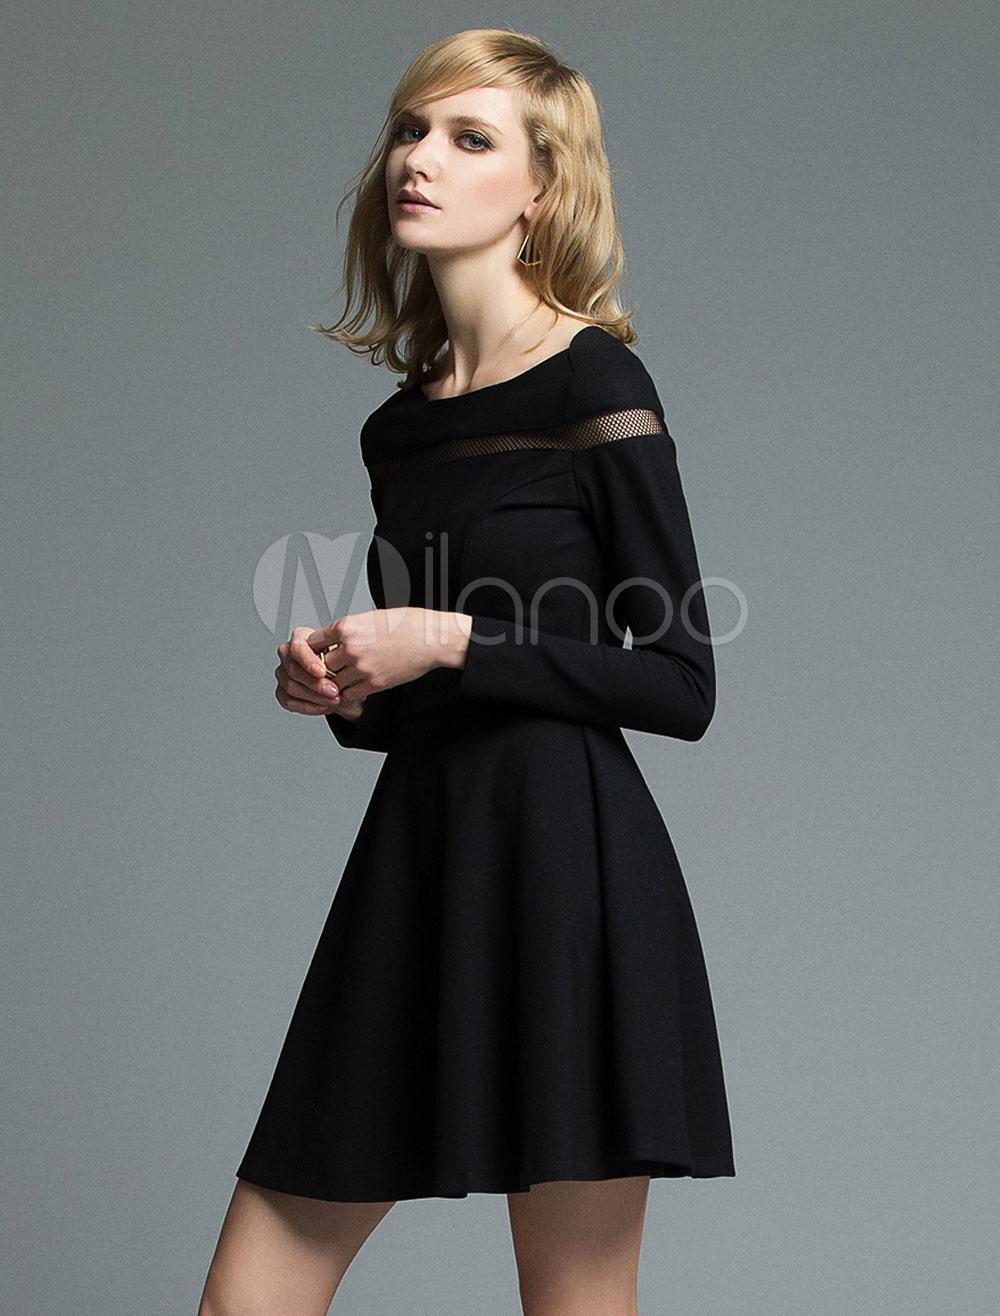 Black Skater Dress Long Sleeve Short Evening Dress Women's Net Crewneck Pleated A Line Dress (Women\\'s Clothing Skater Dresses) photo